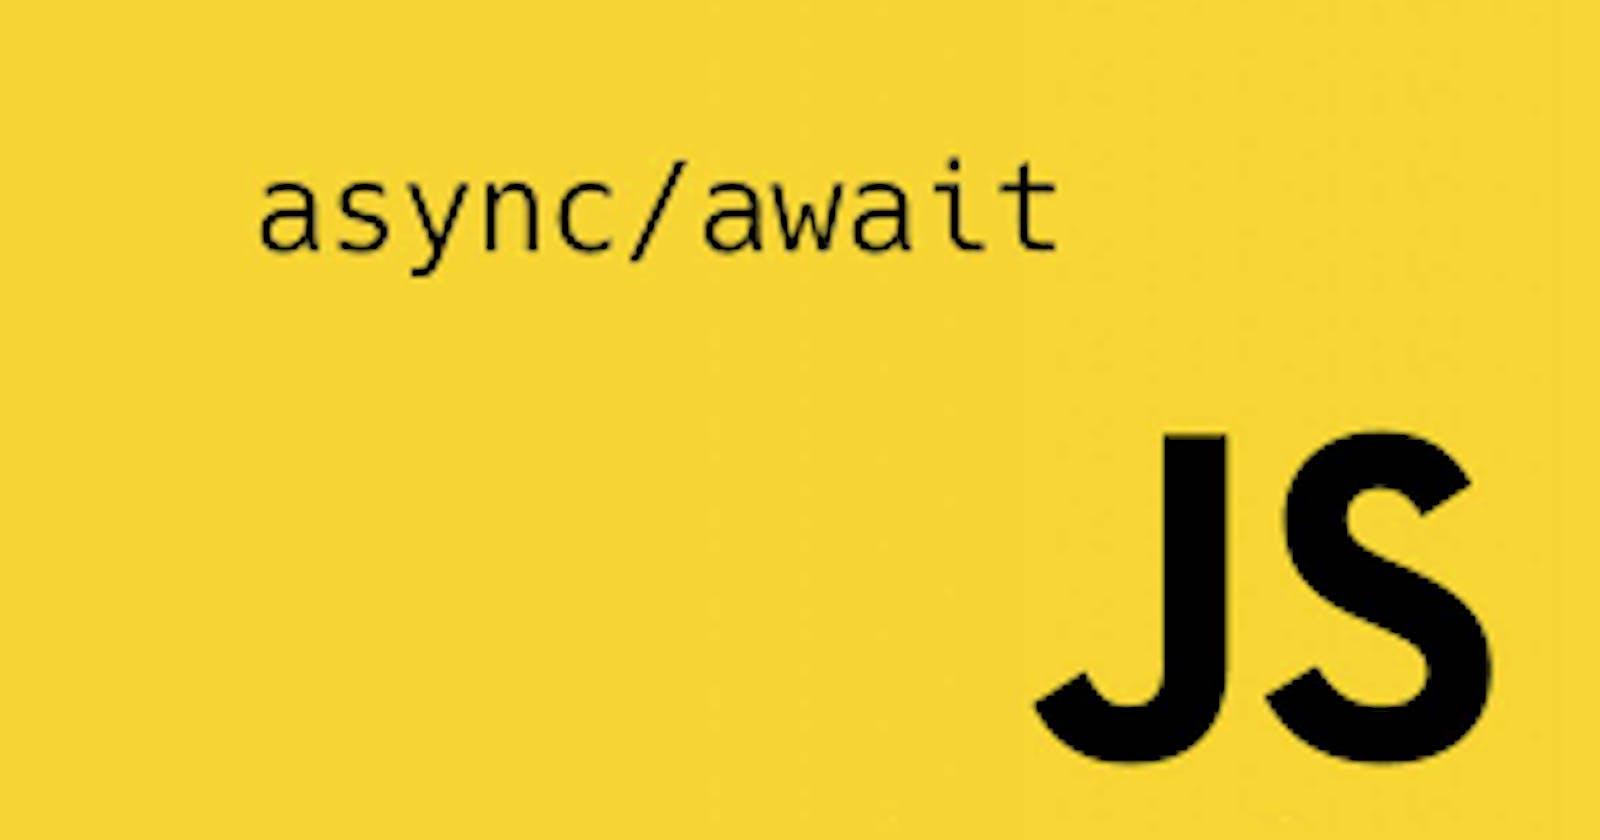 A Taste of Syntactic Sugar with Async/await